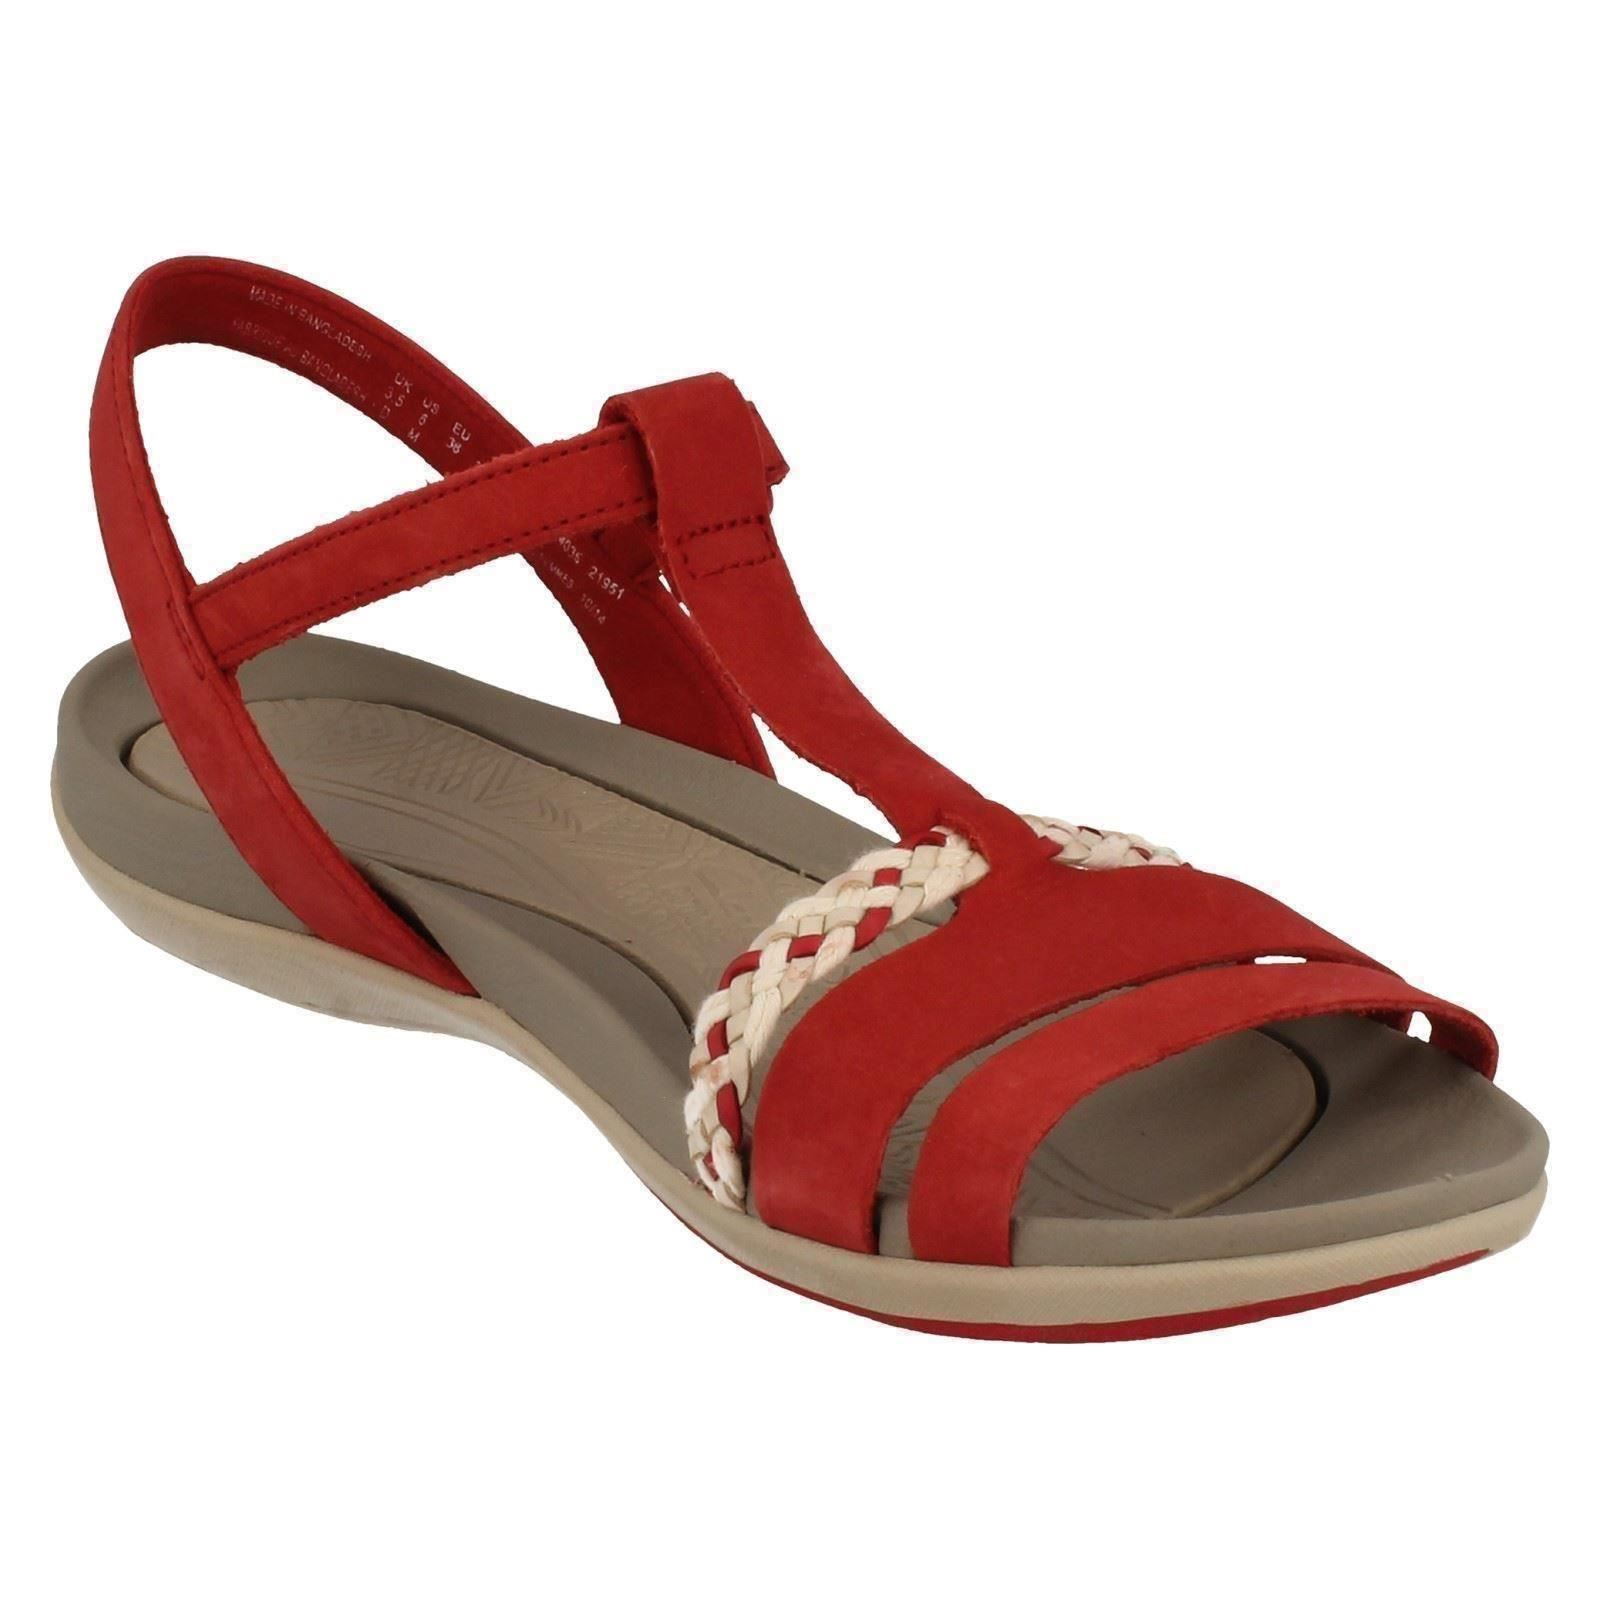 6cedd2662eb Ladies-Clarks-Casual-Summer-Sandals-Tealite-Grace thumbnail 12